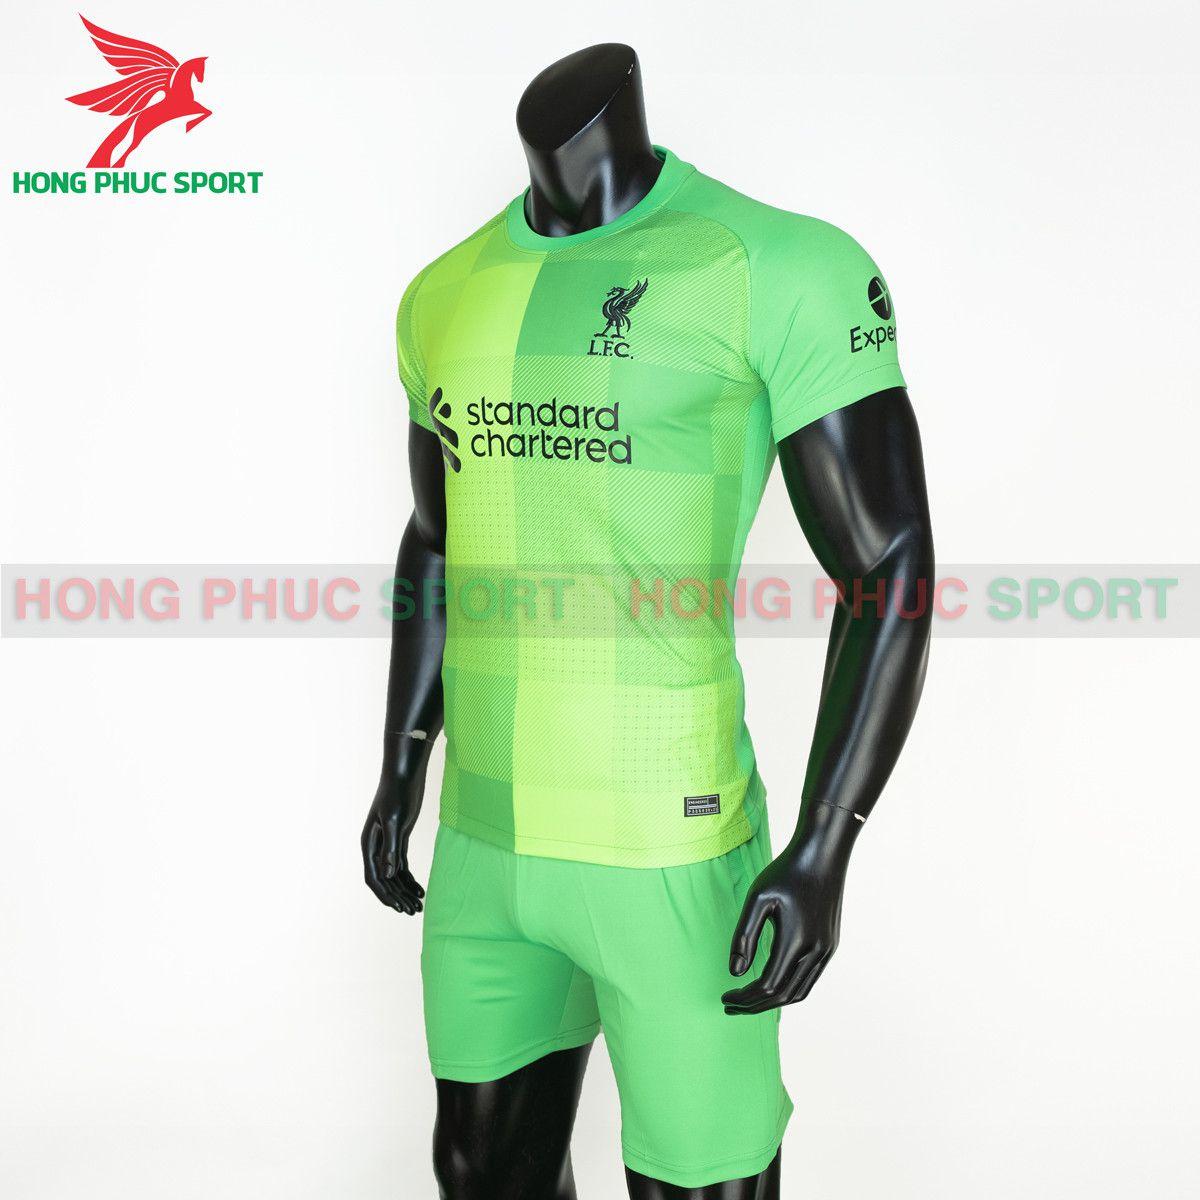 https://cdn.hongphucsport.com/unsafe/s4.shopbay.vn/files/285/ao-thu-mon-liverpool-2021-2022-thailand-2-6140310c28aa5.jpg